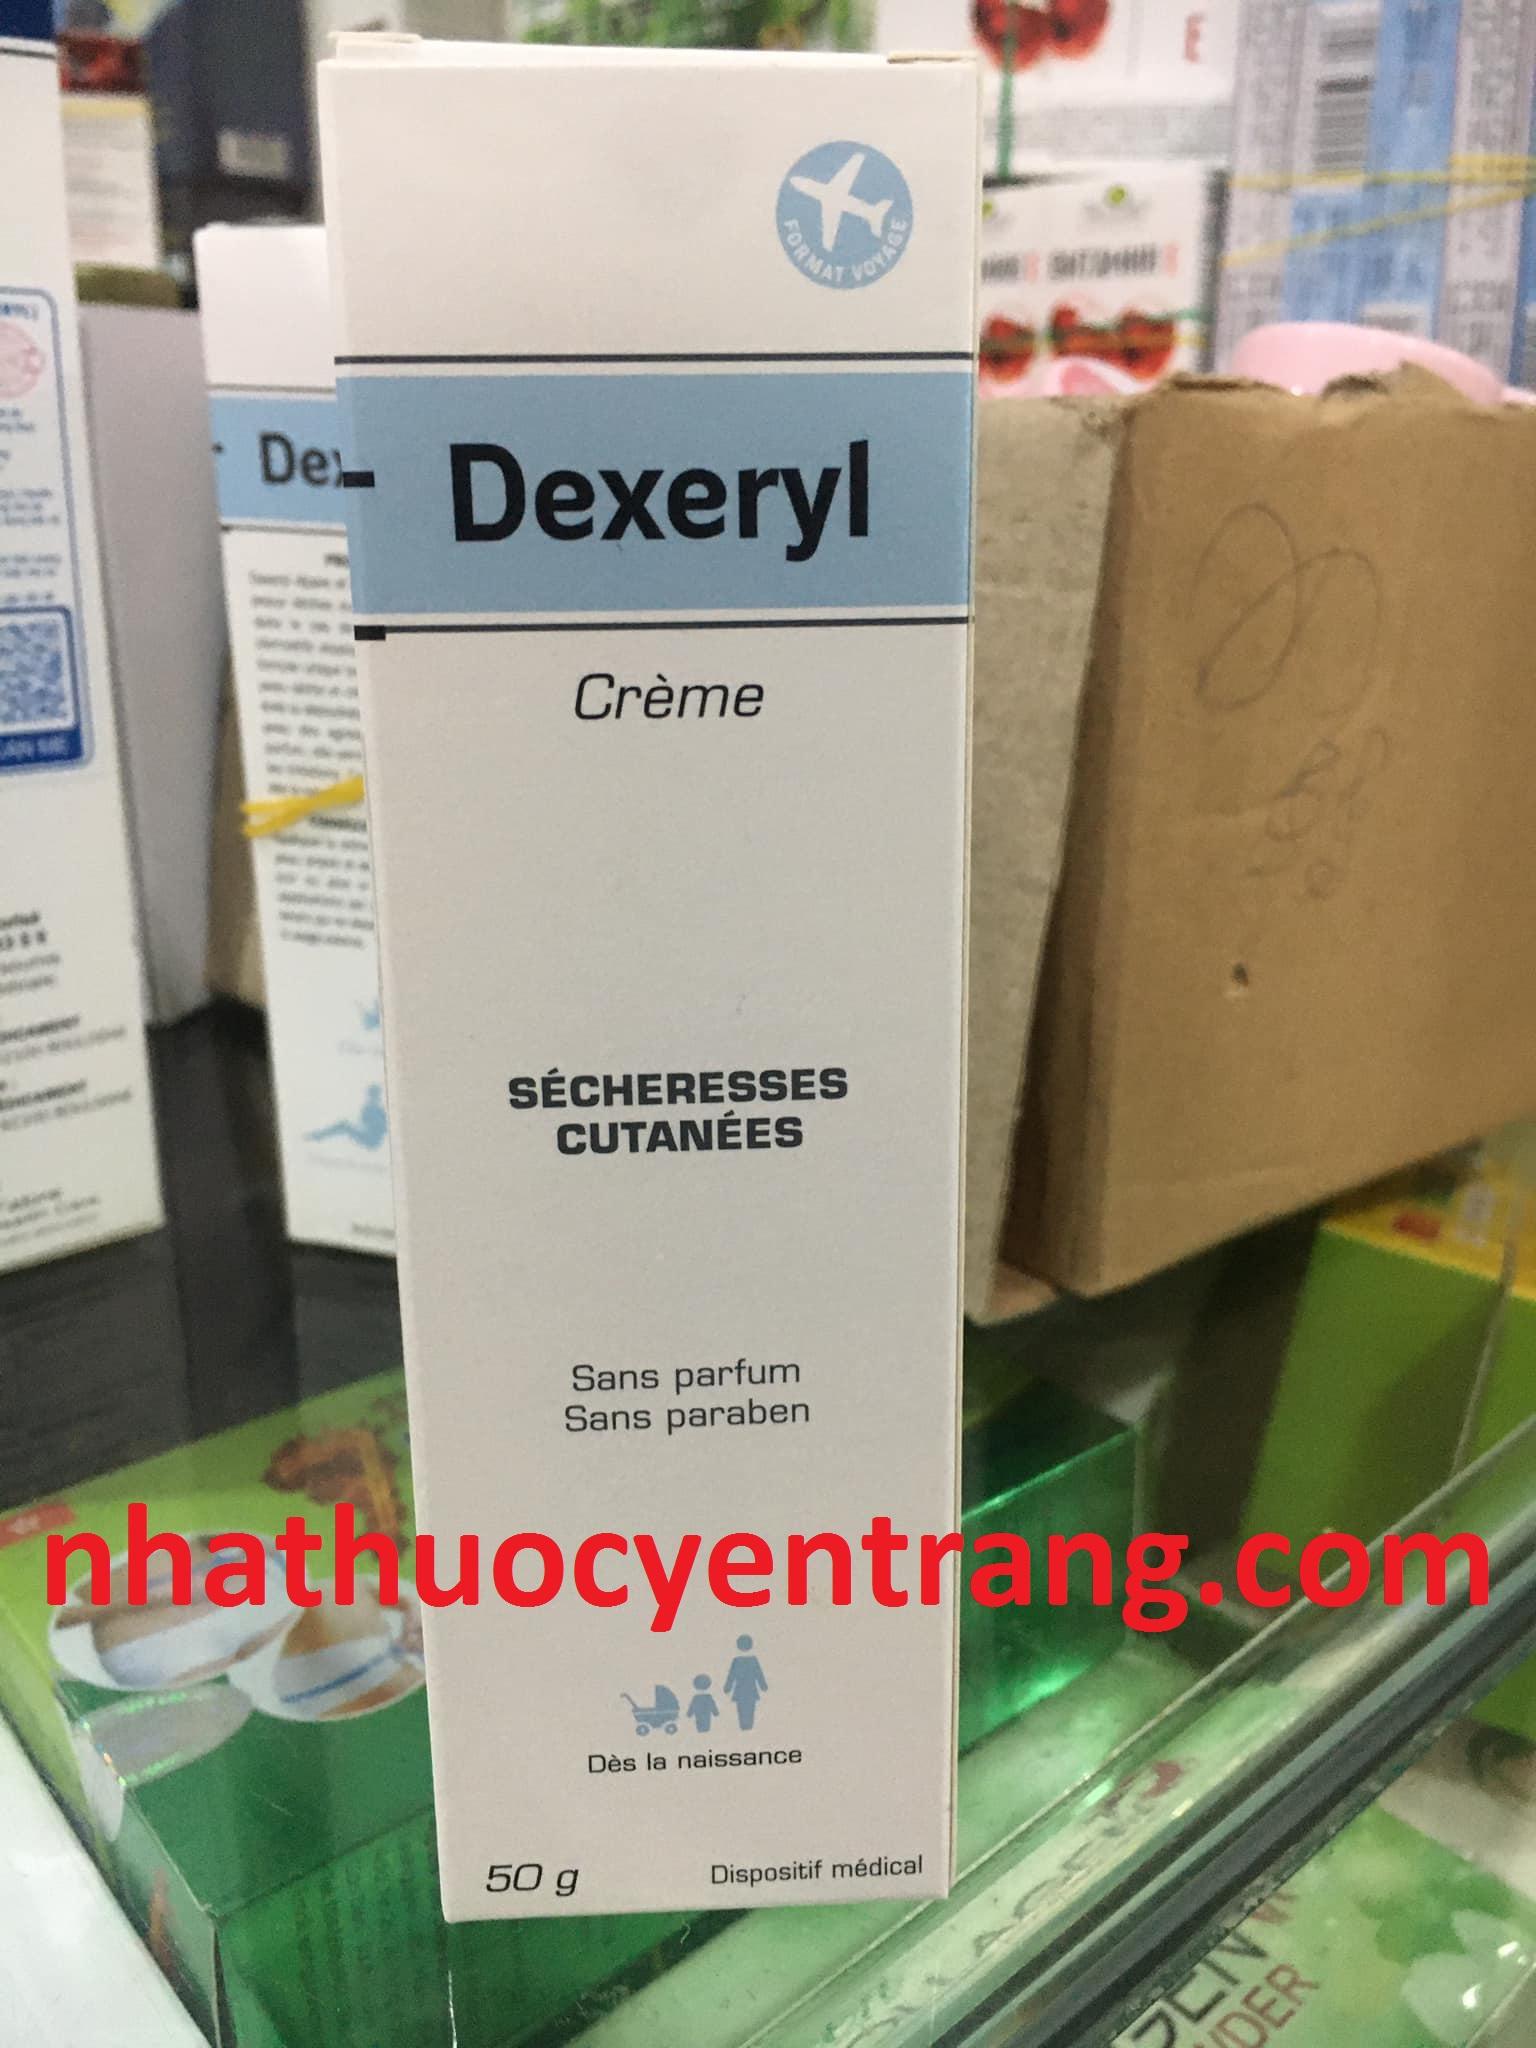 Dexeryl cream 50g